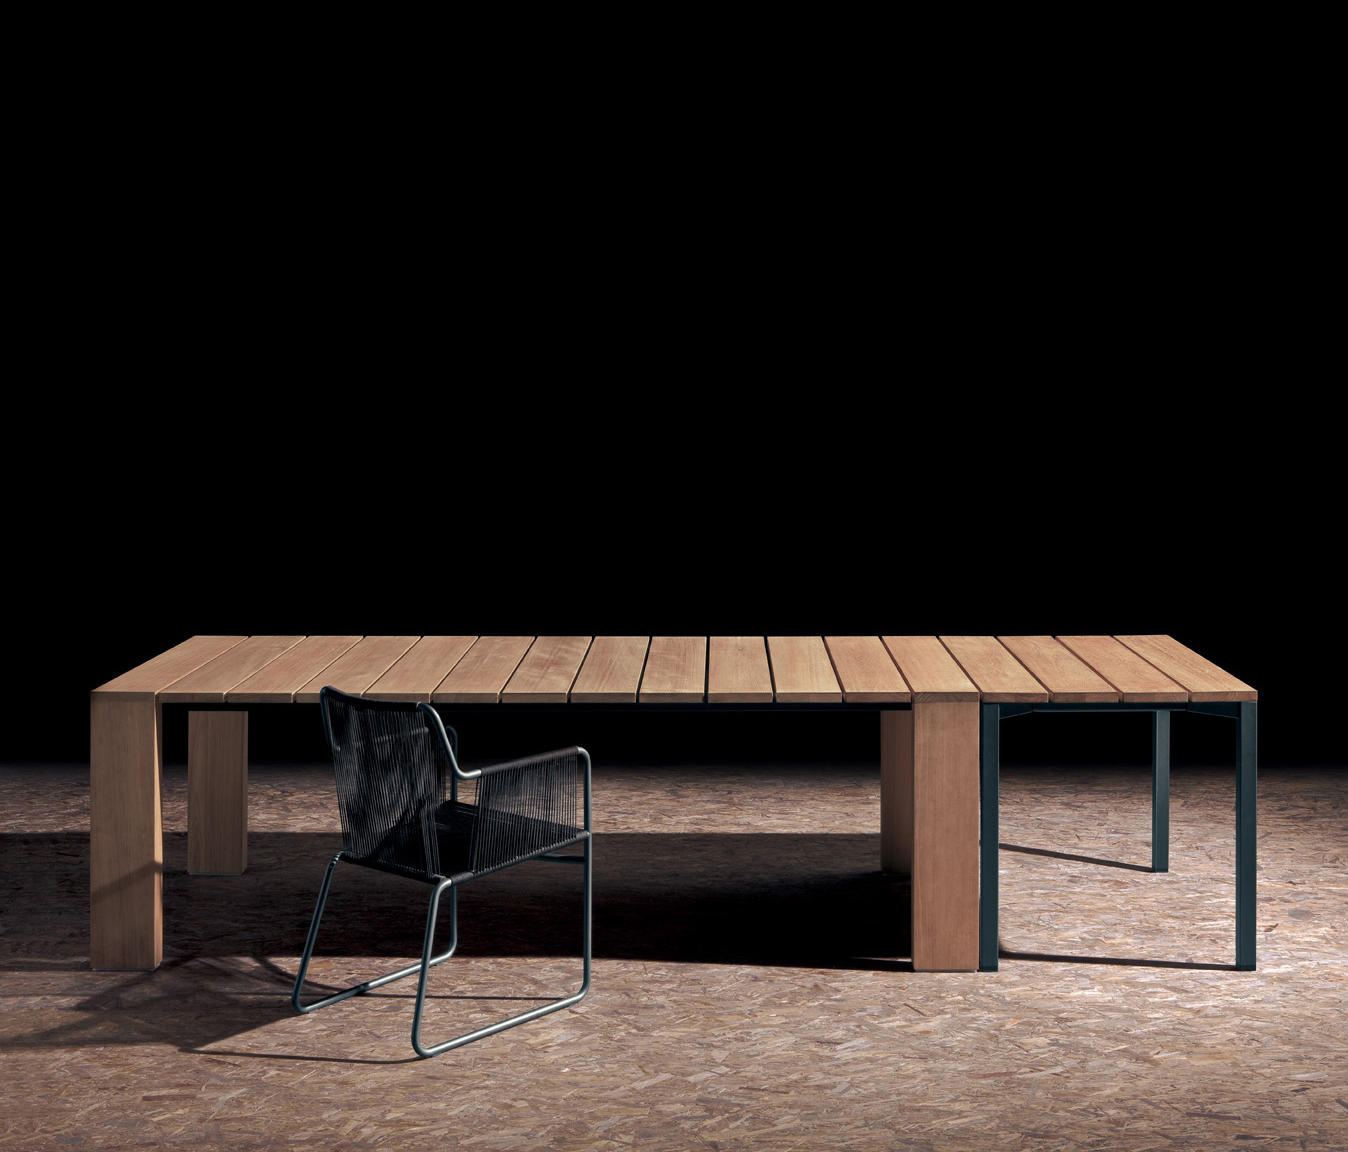 Roda Tavoli Da Giardino.Pier 017 Dining Tables From Roda Architonic